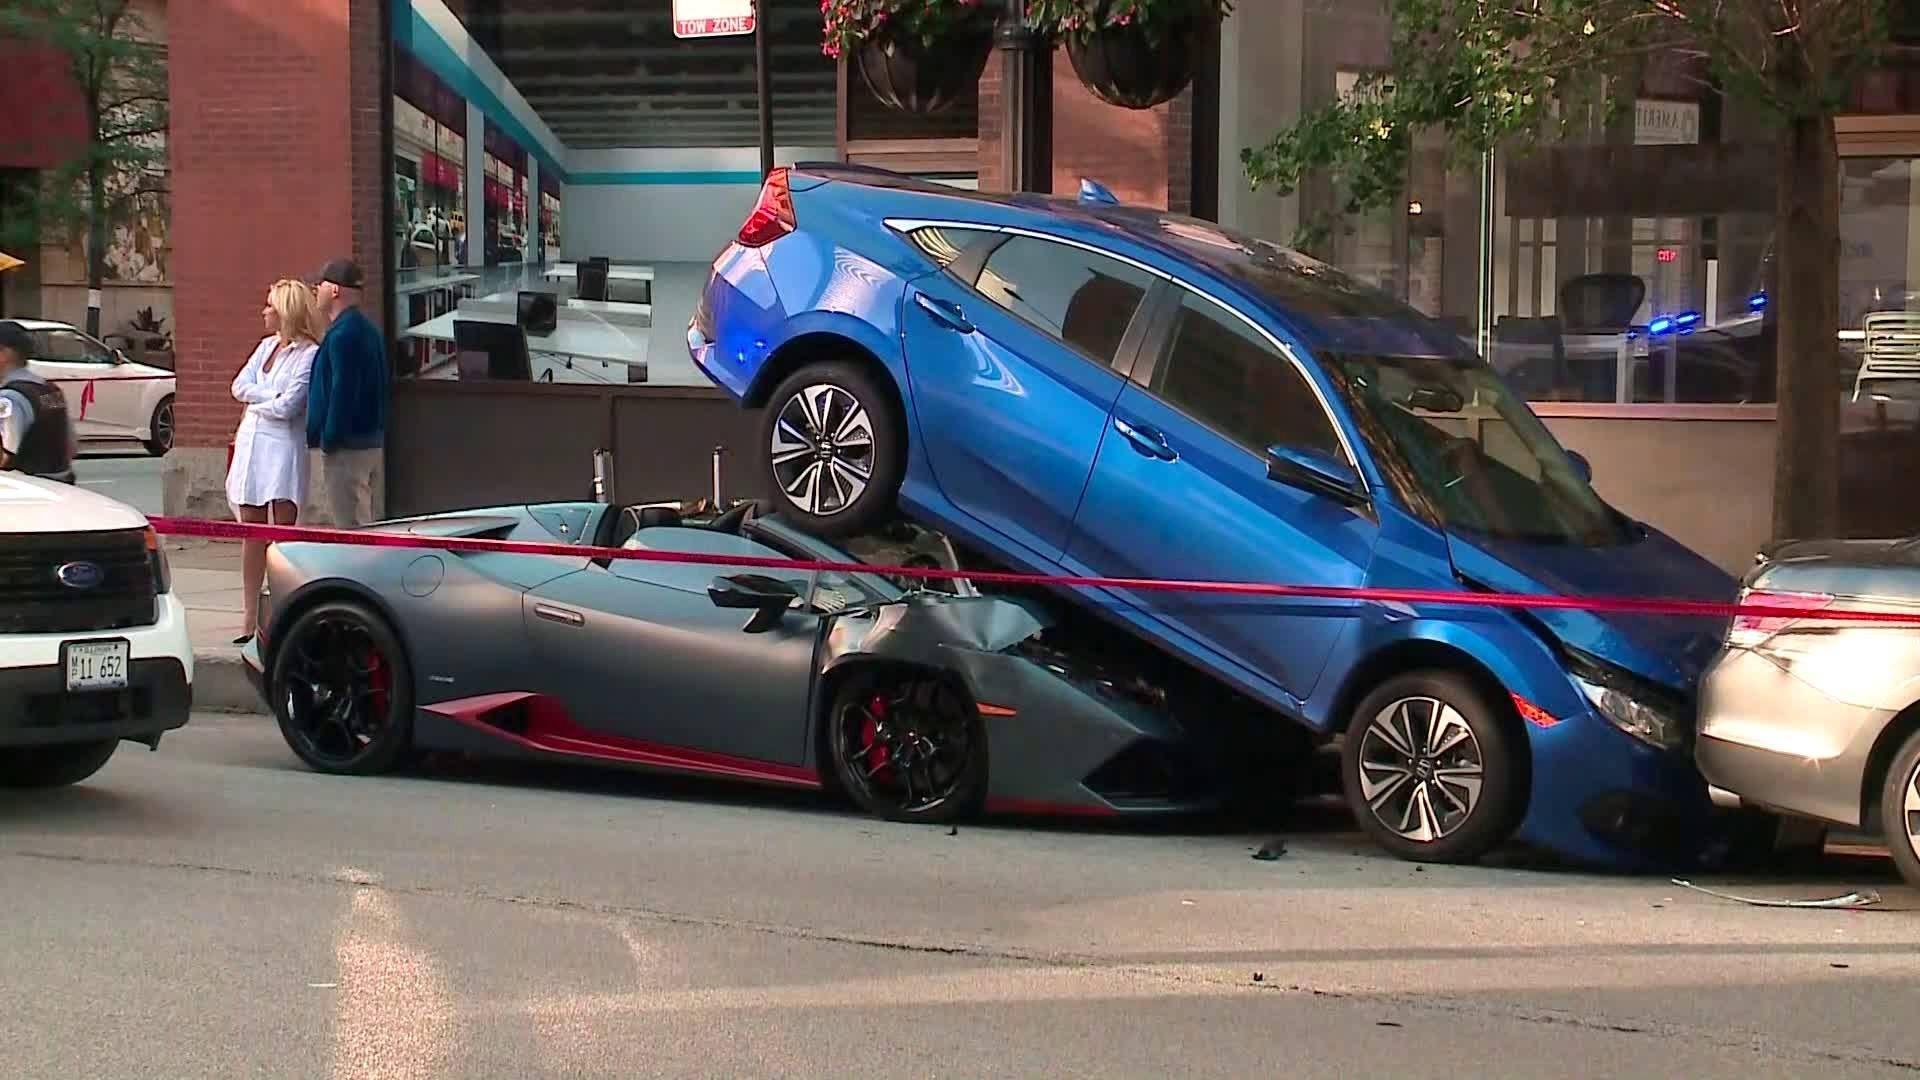 Lamborghini Huracan Lost Parkeerprobleem Effectief Op Lamborghini Huracan Honda Civic Lamborghini Huracan Spyder